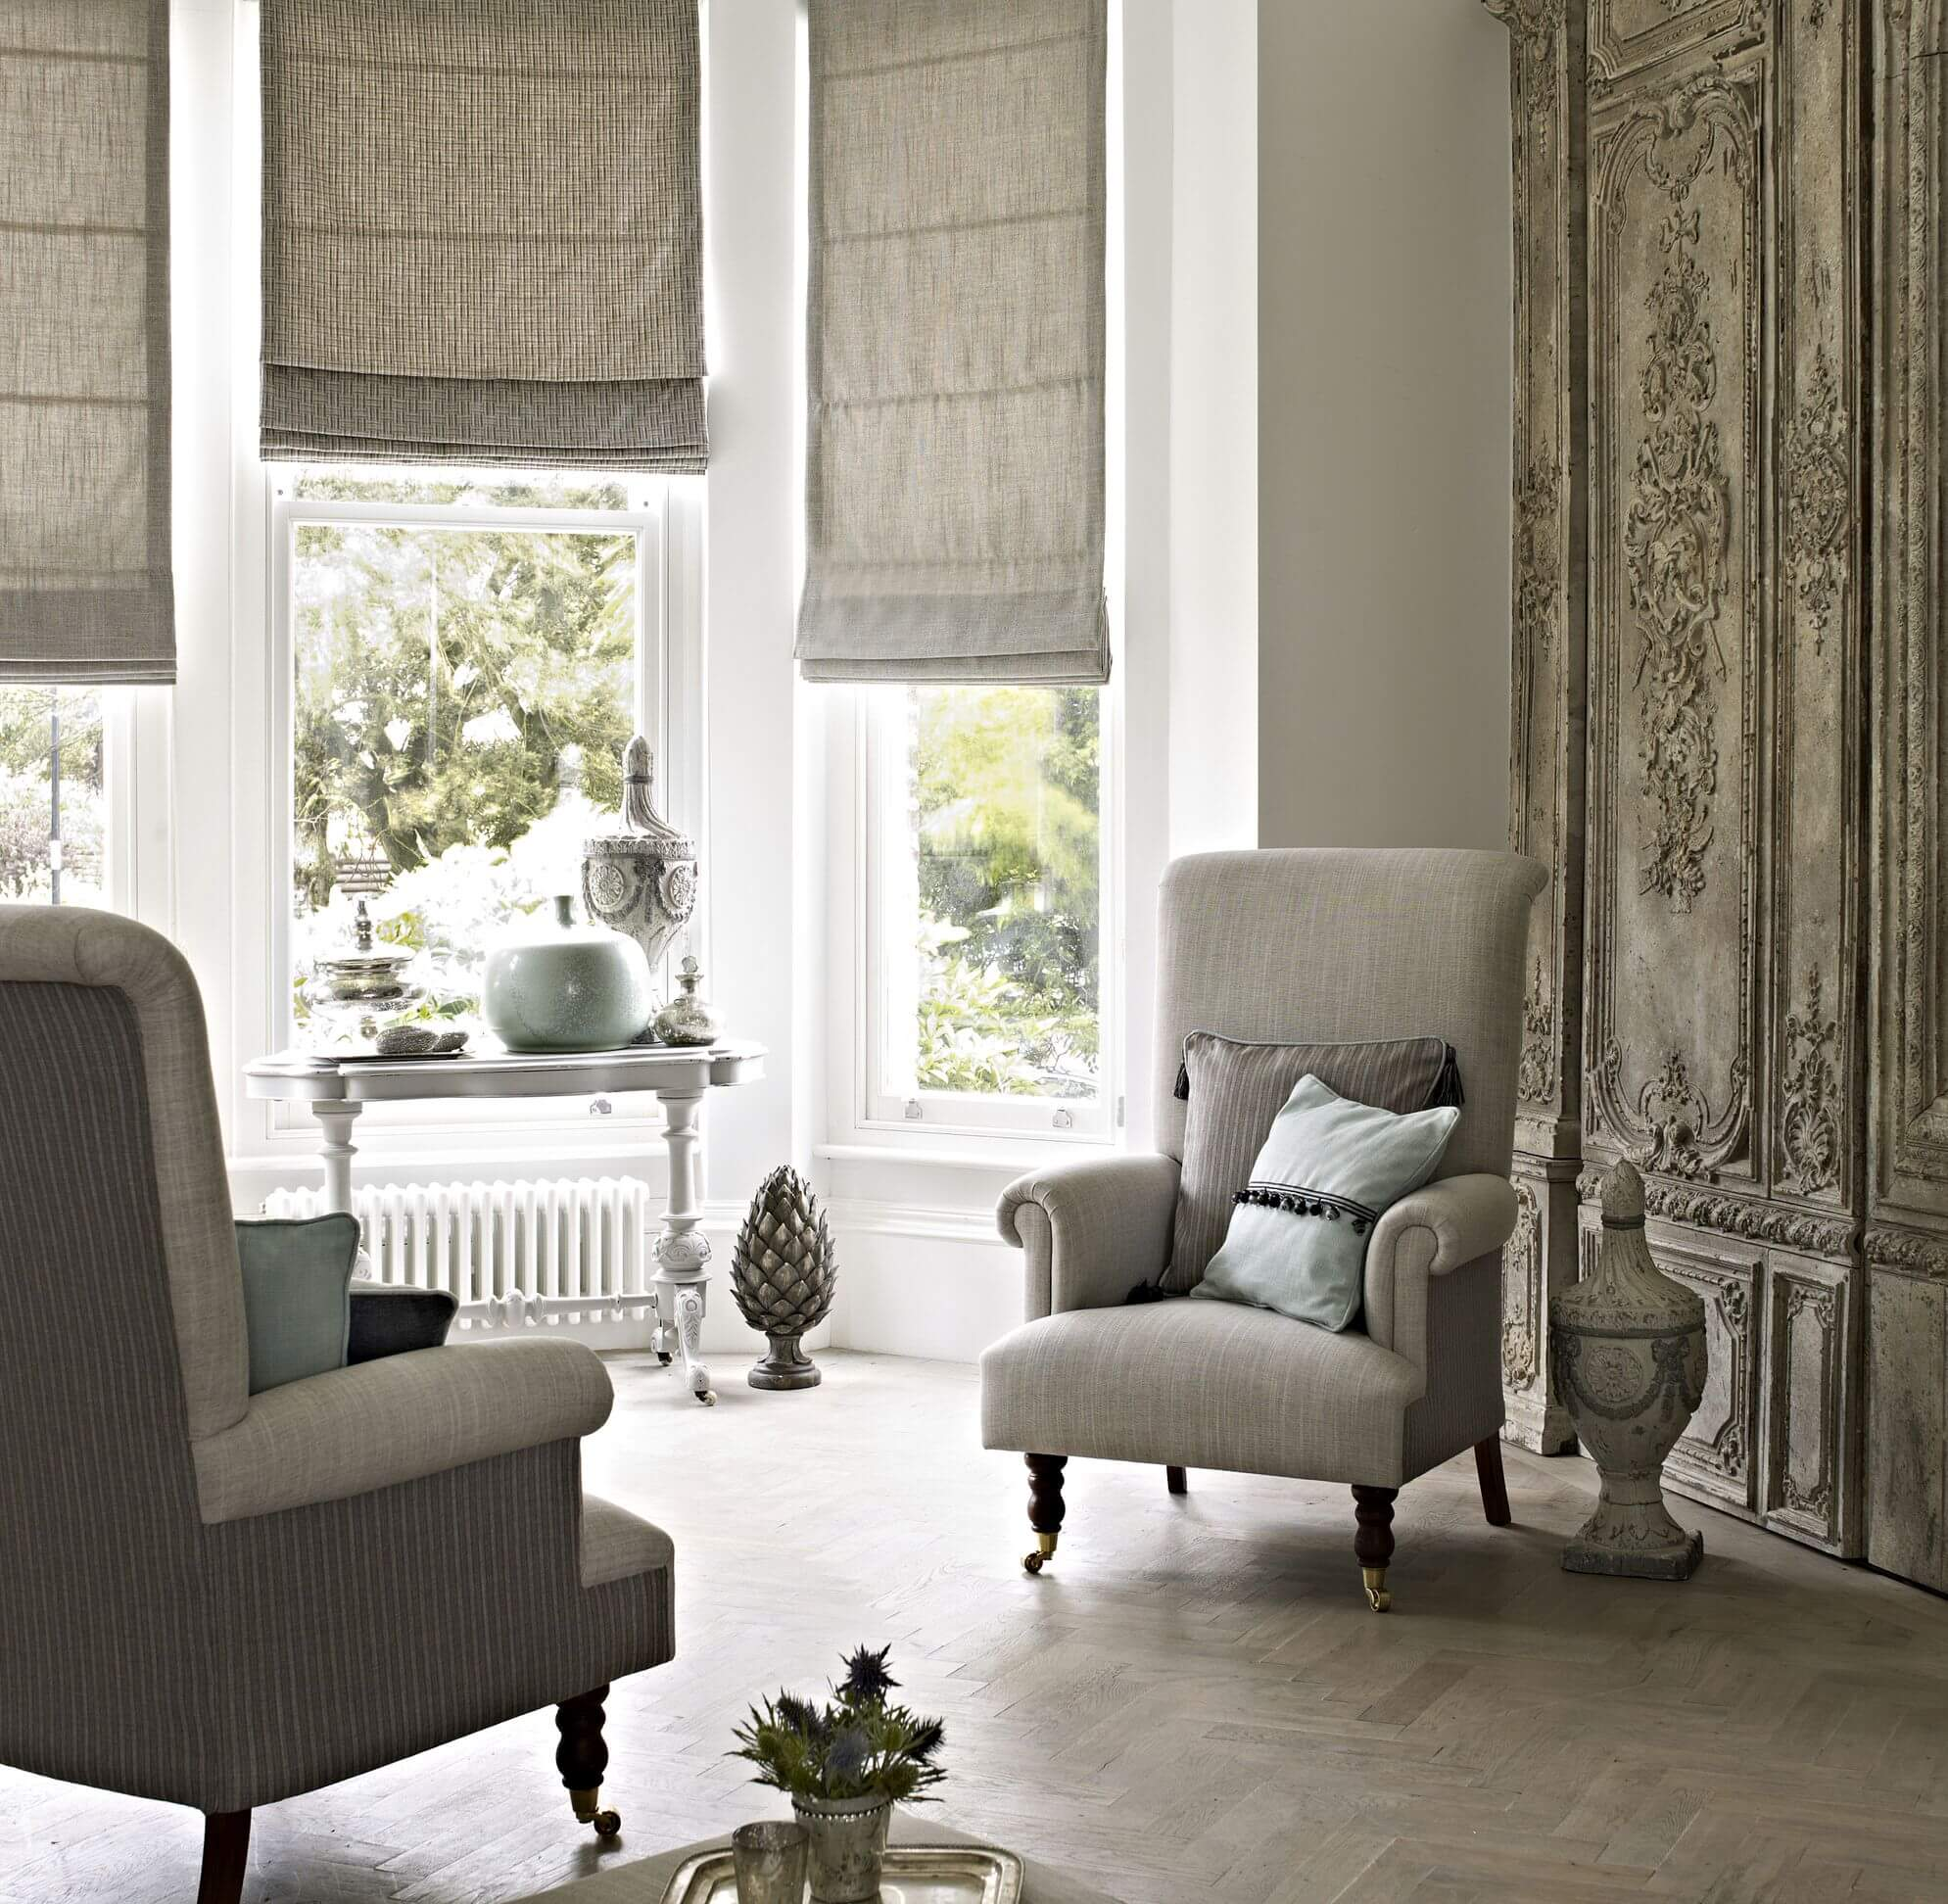 raffrollos in berlin anfertigen lassen adler wohndesign. Black Bedroom Furniture Sets. Home Design Ideas